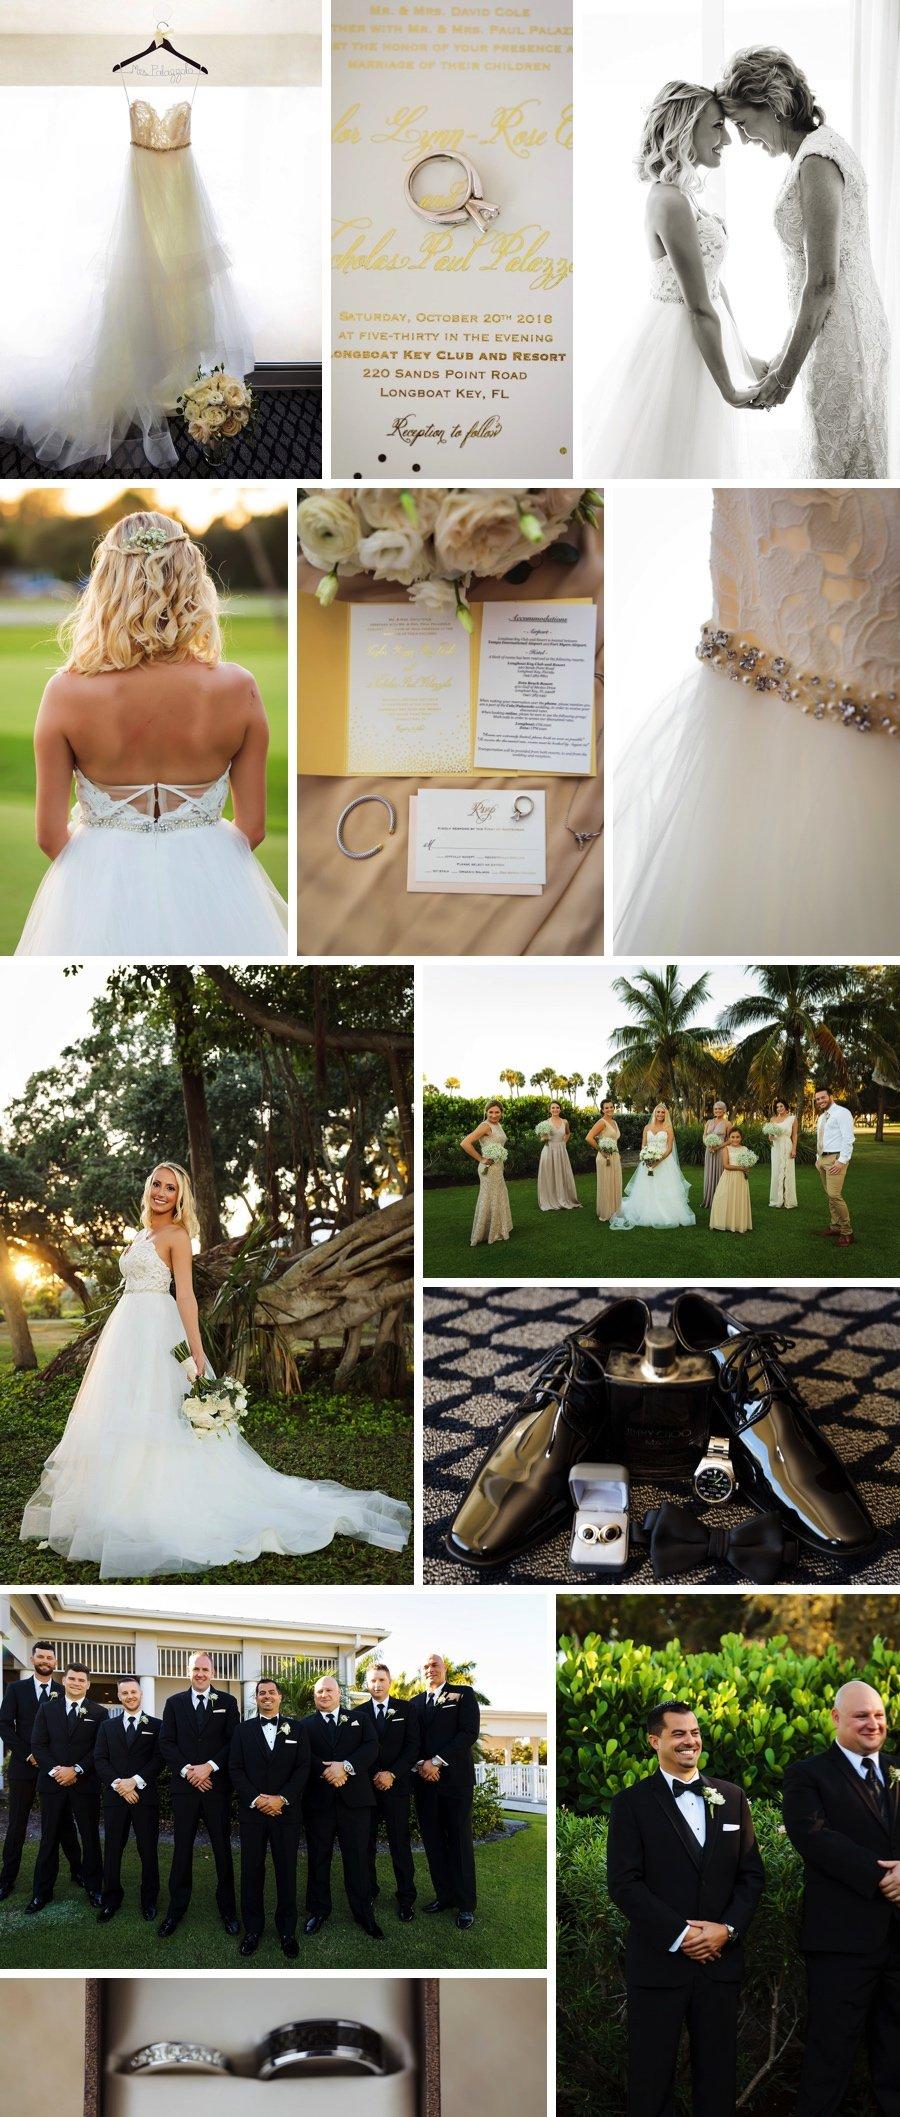 Real wedding: Love in Longboat